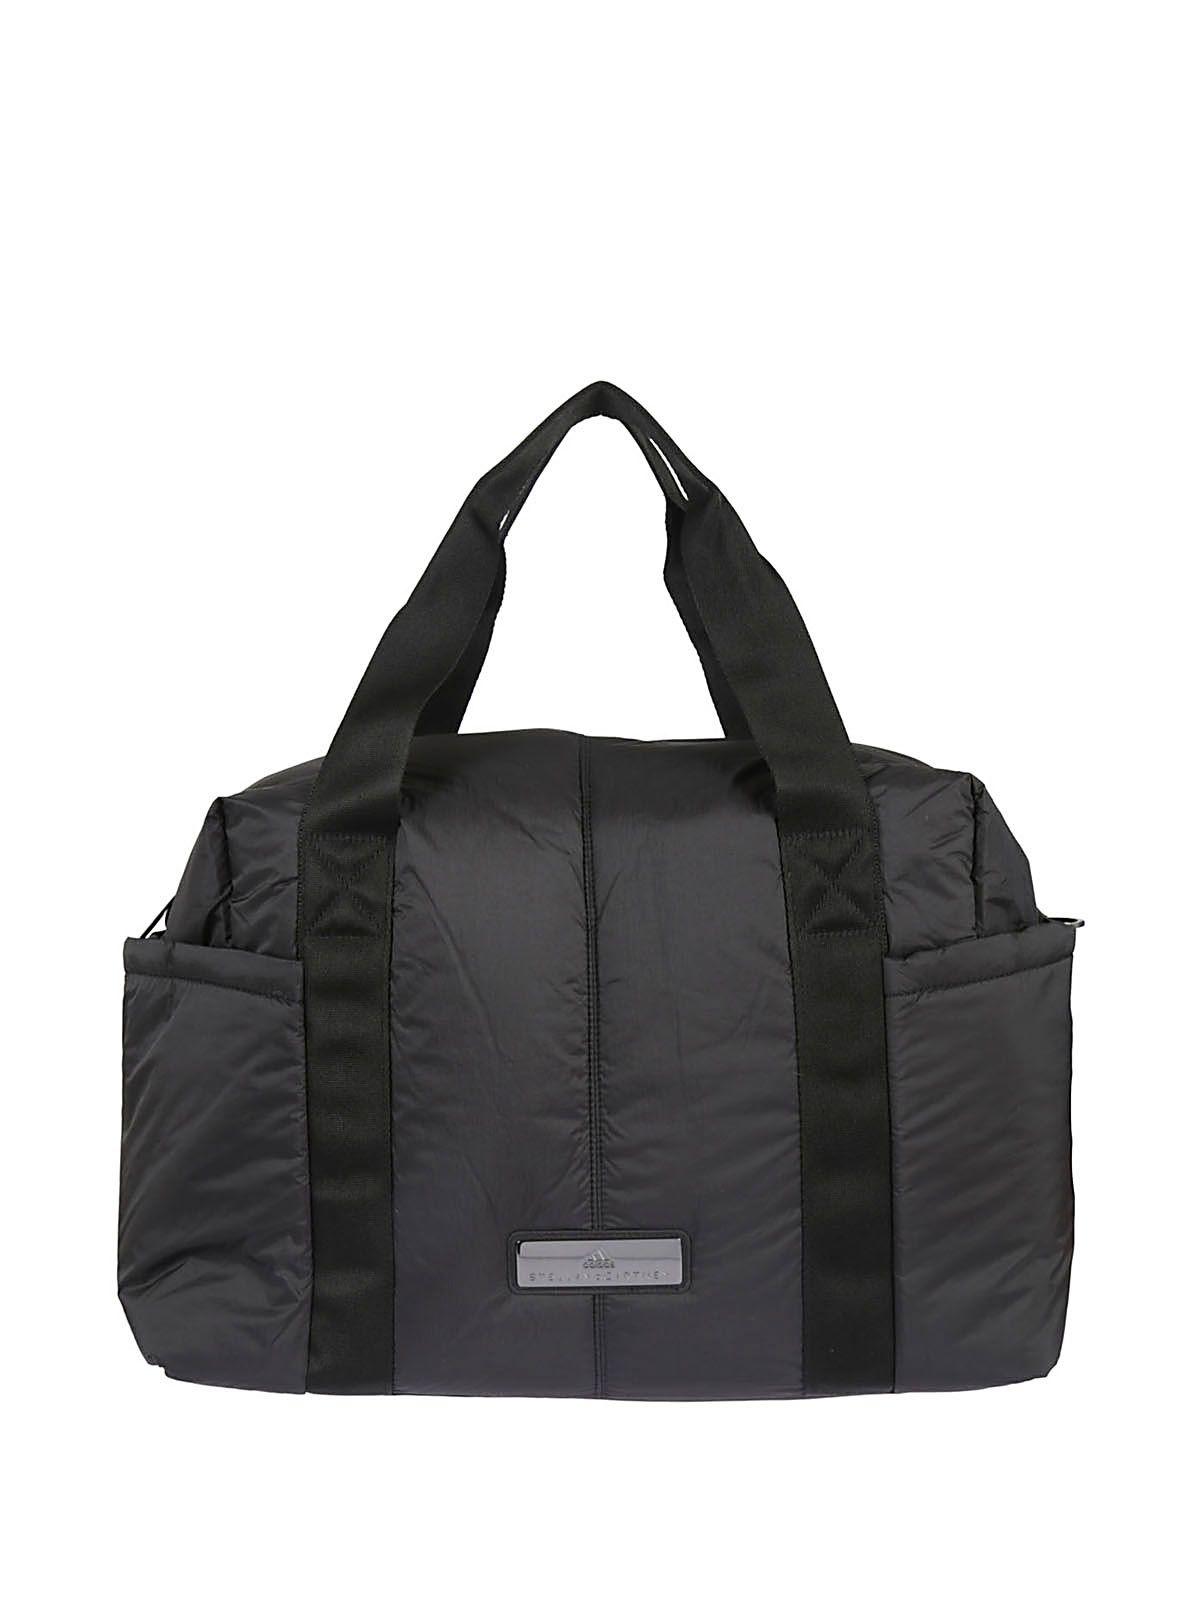 5a71d39b7b6c Stella Mccartney Shipshape Gym Bag